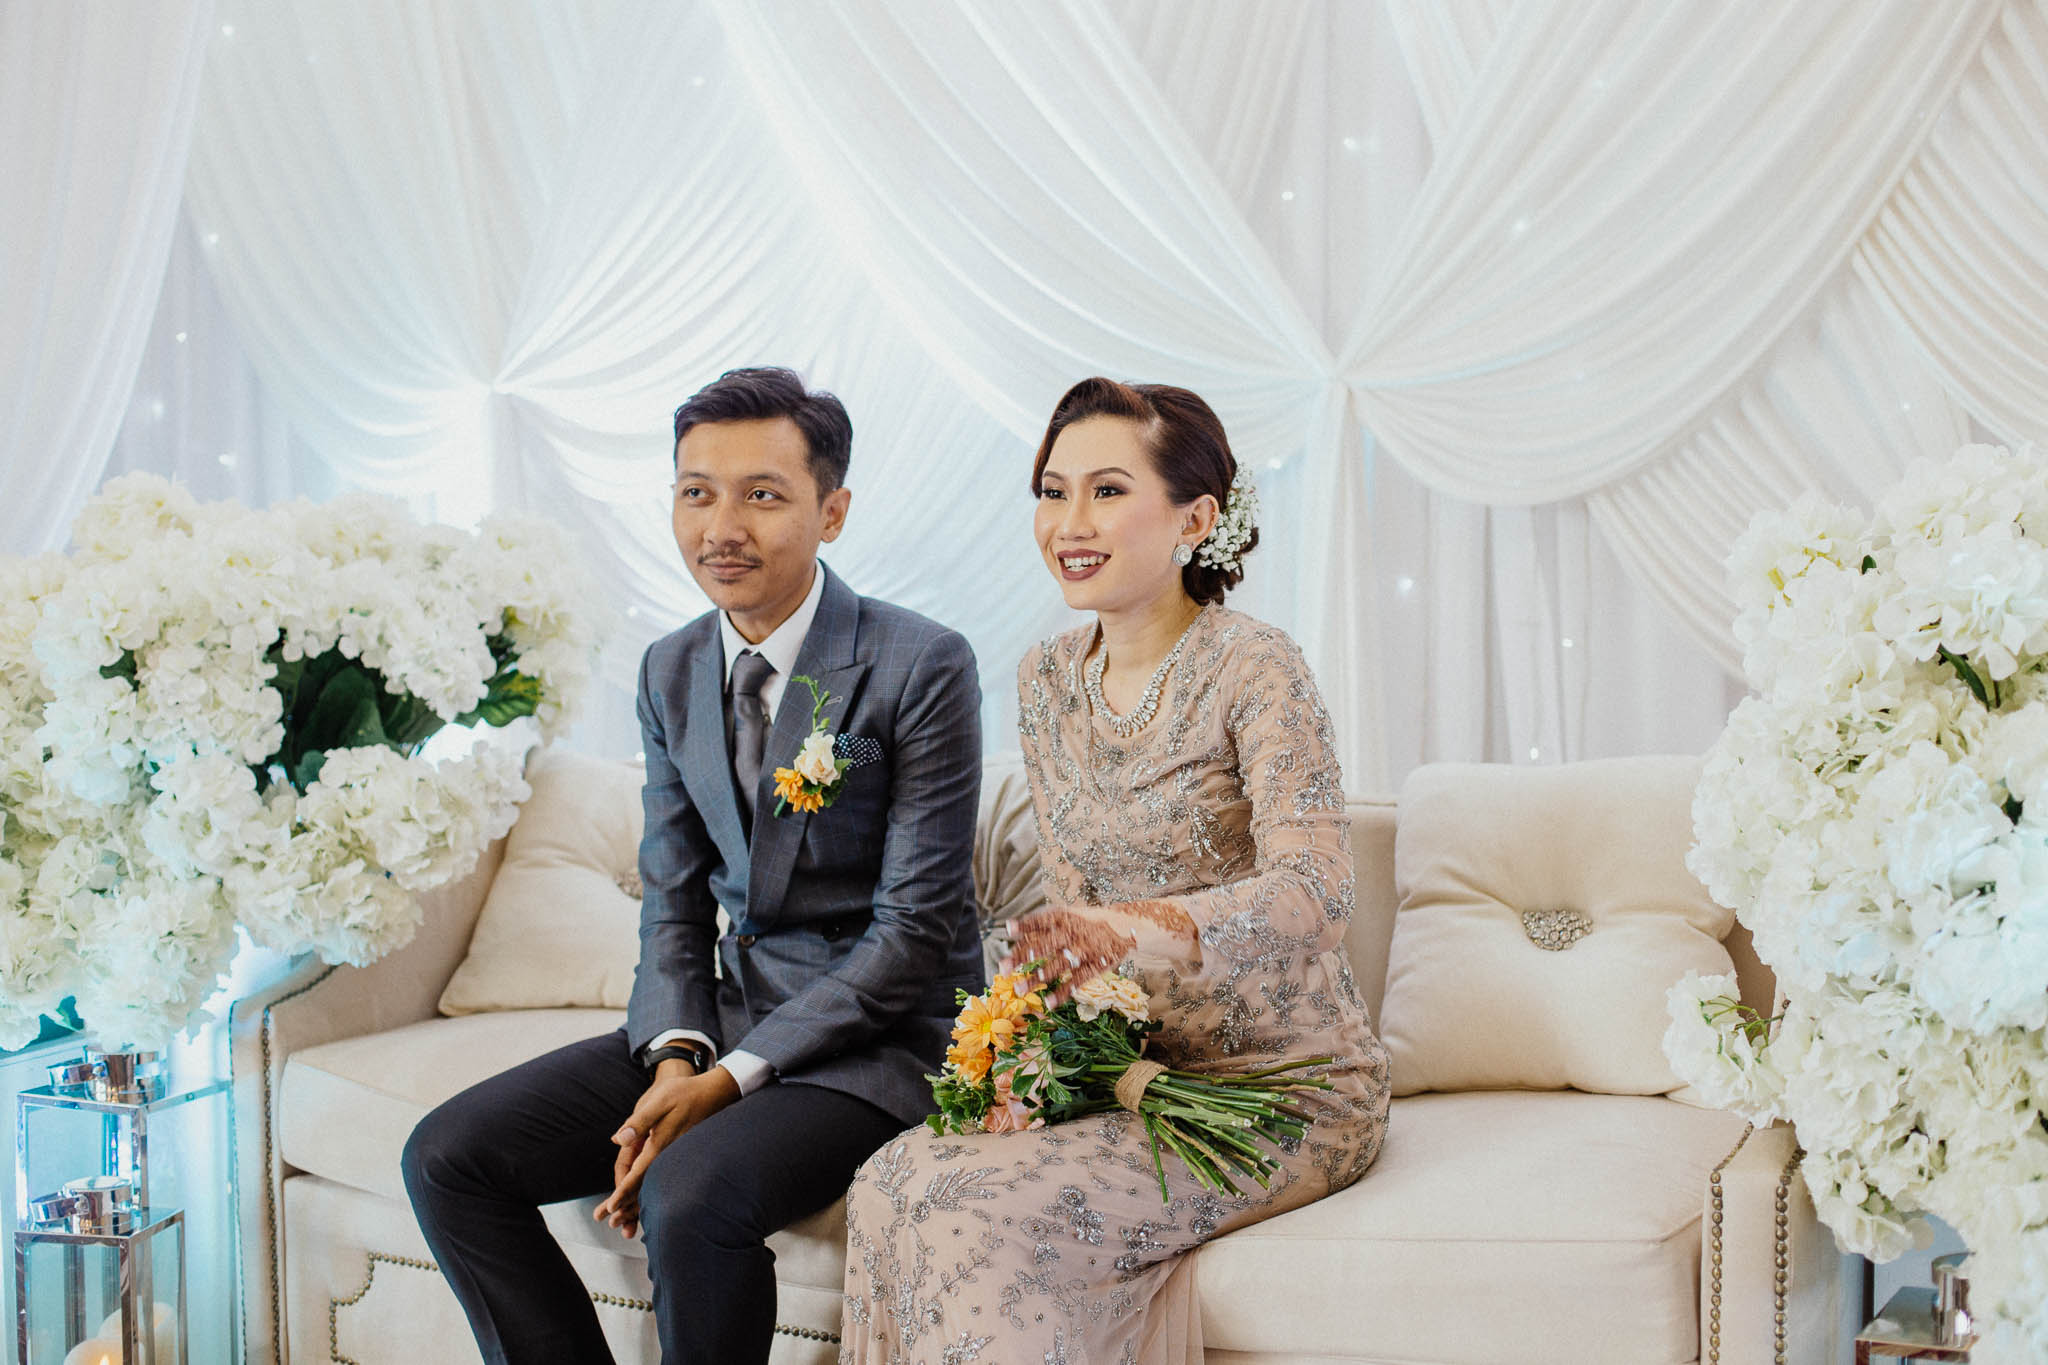 singapore-wedding-photographer-wedding-nufail-addafiq-061.jpg